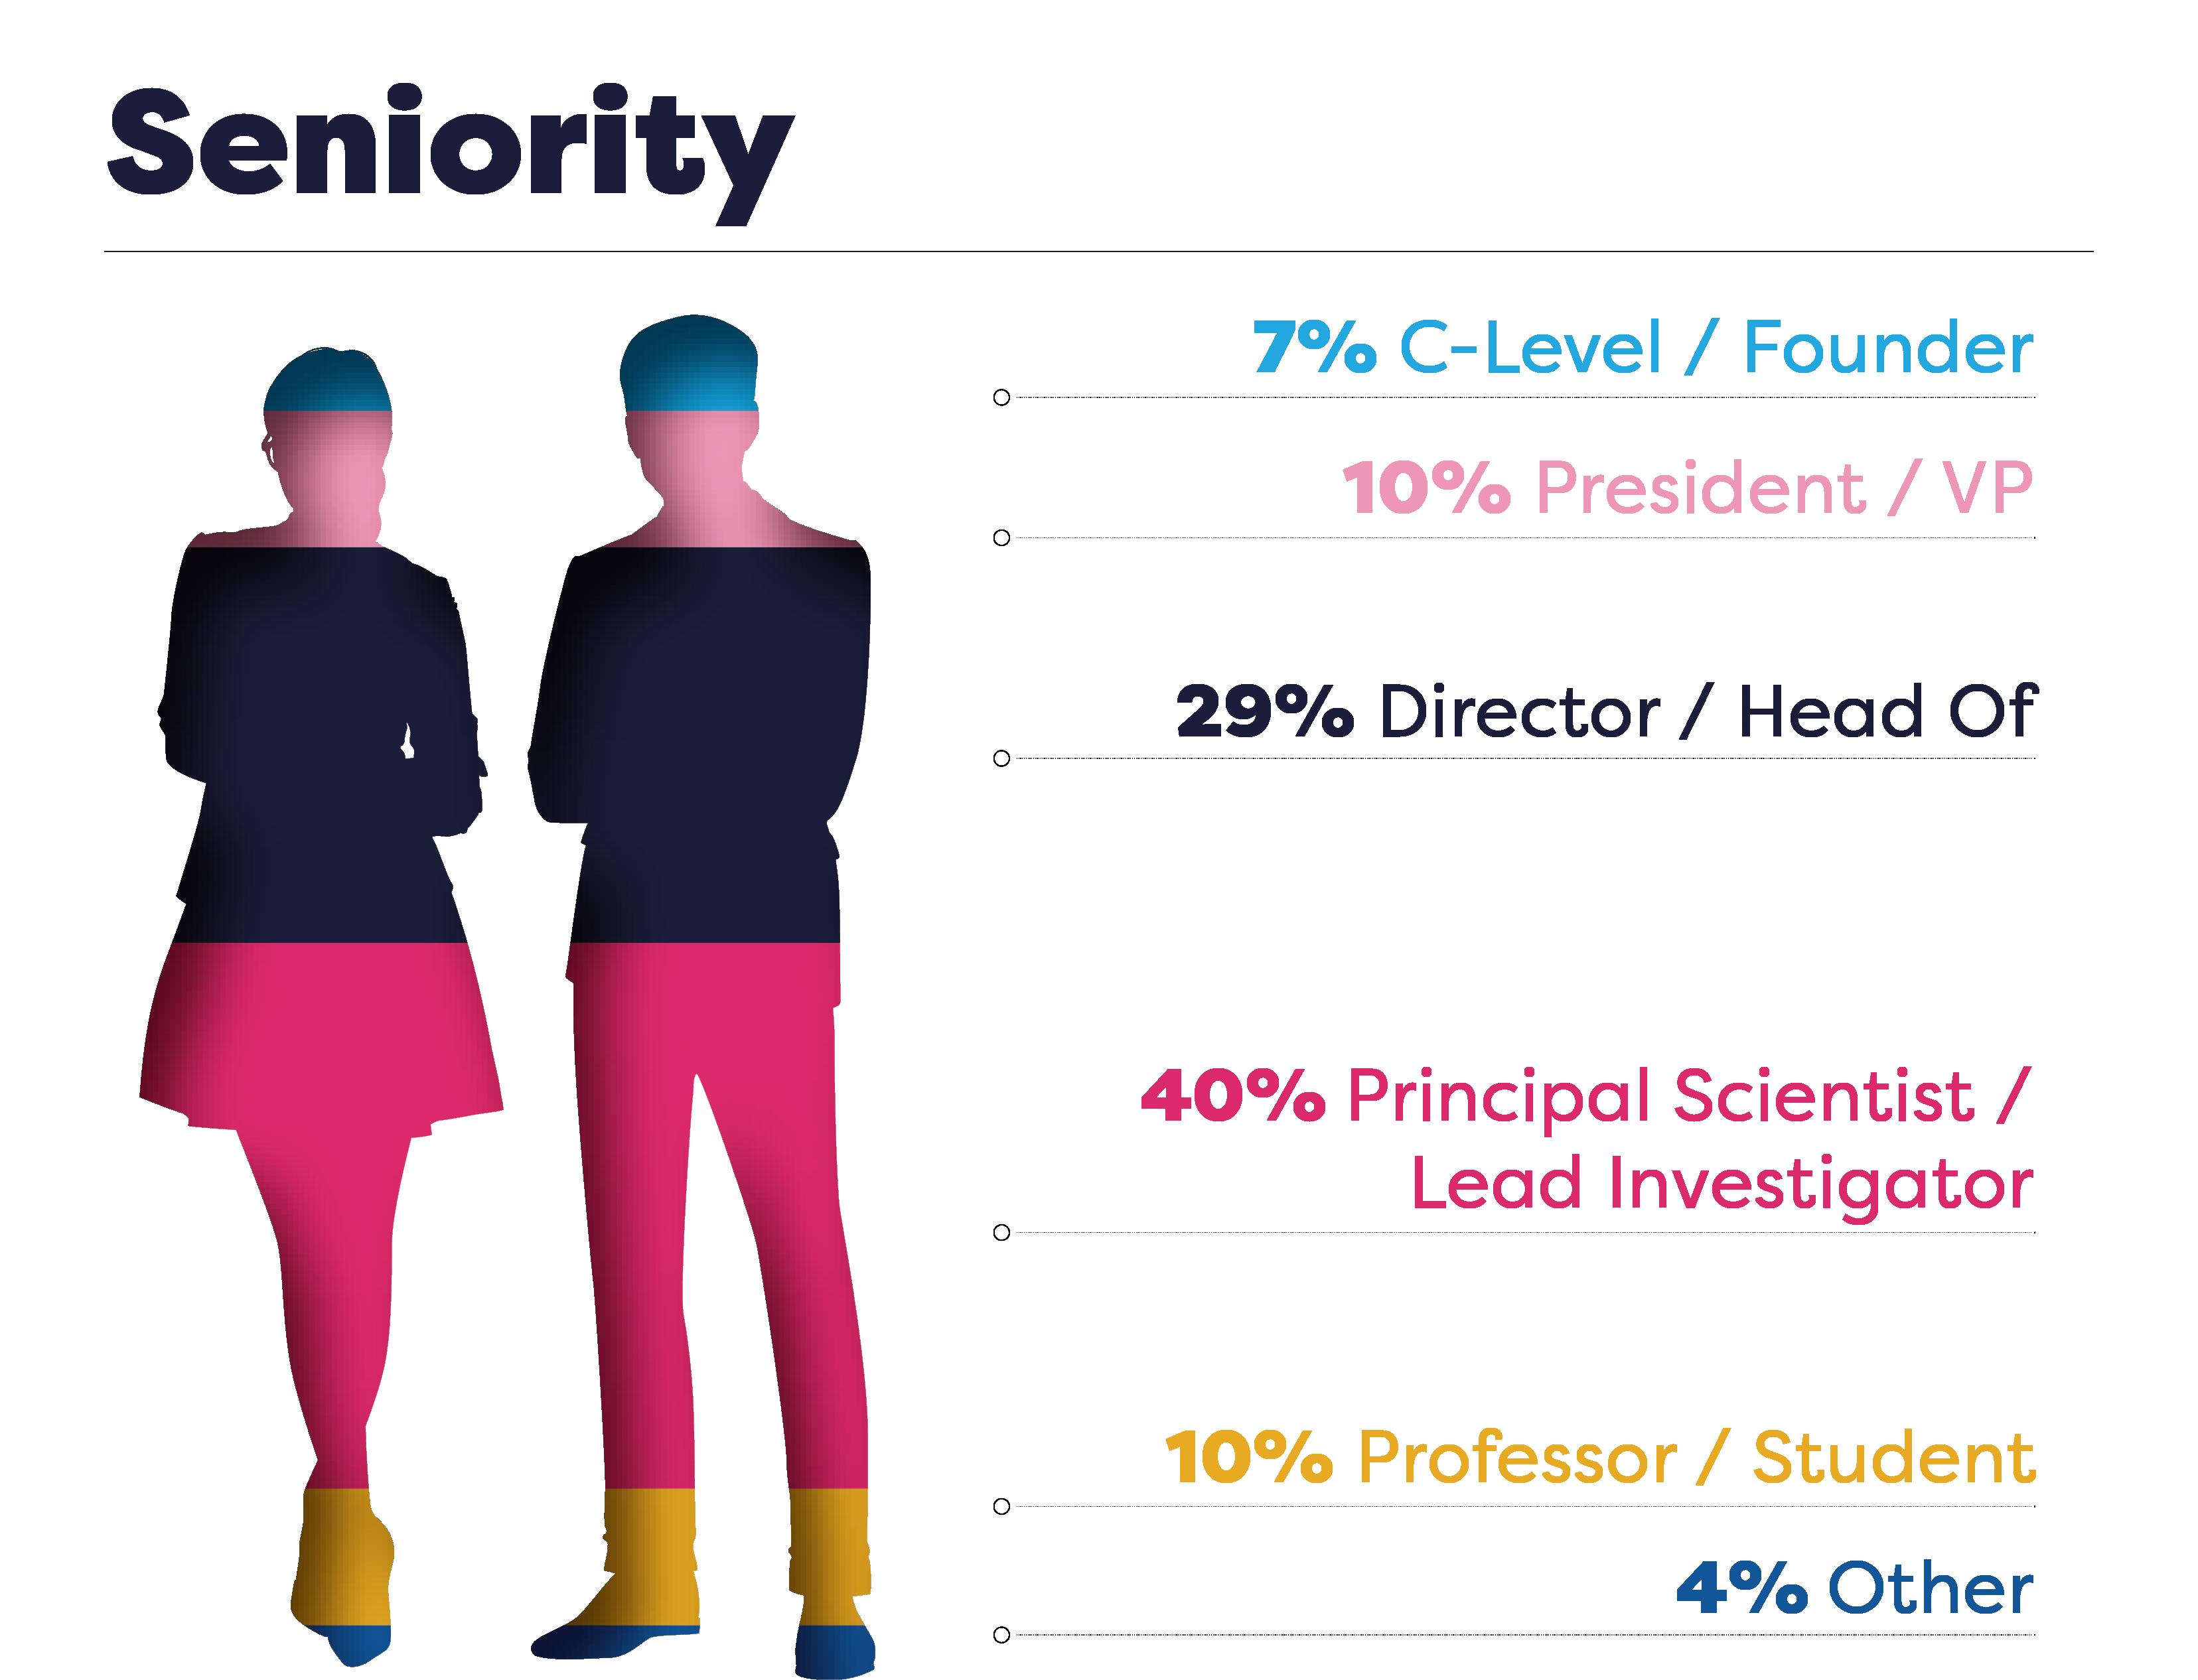 Seniority Stats